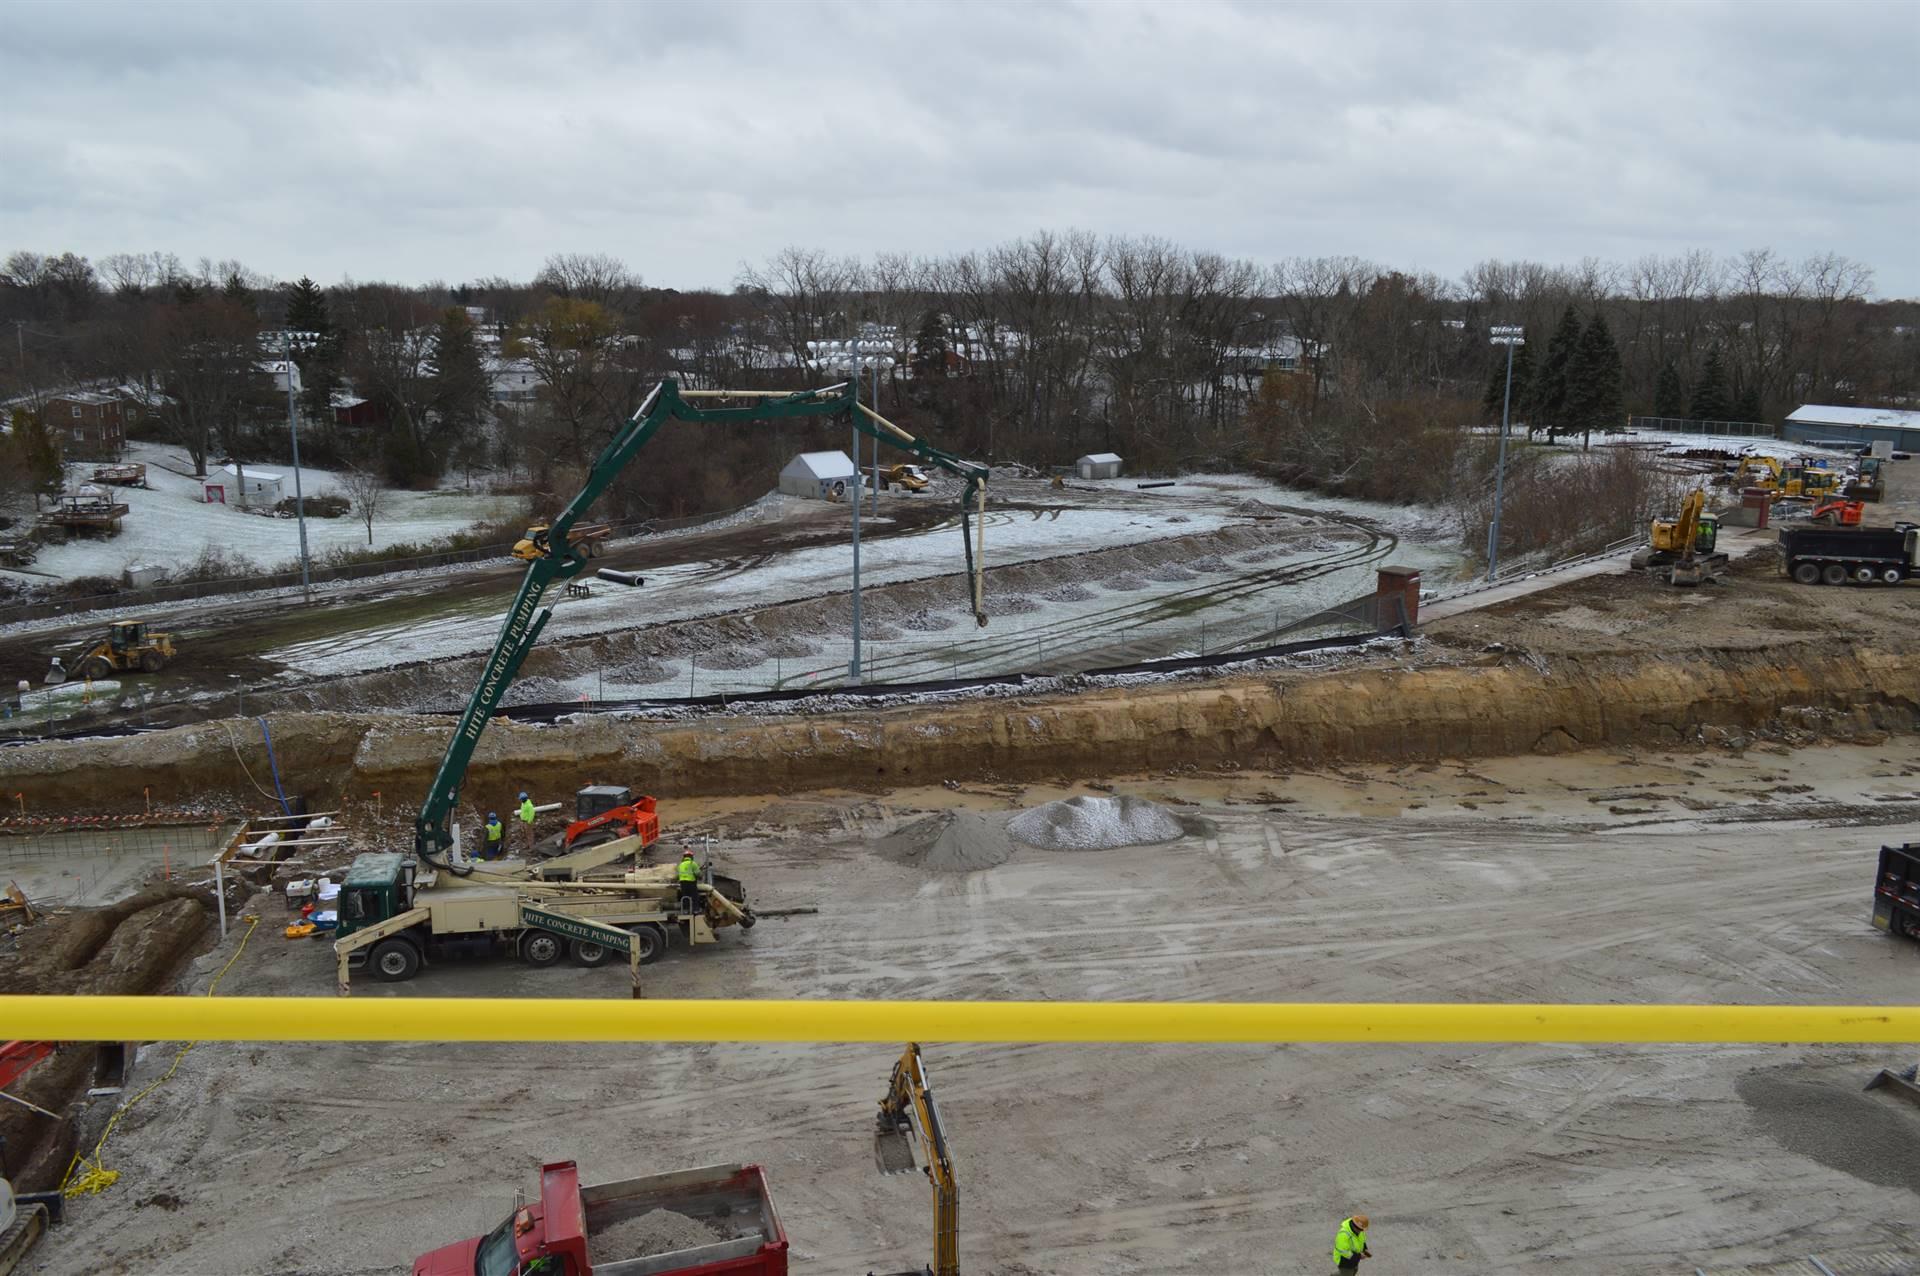 Overlooking work behind RHS, and football field